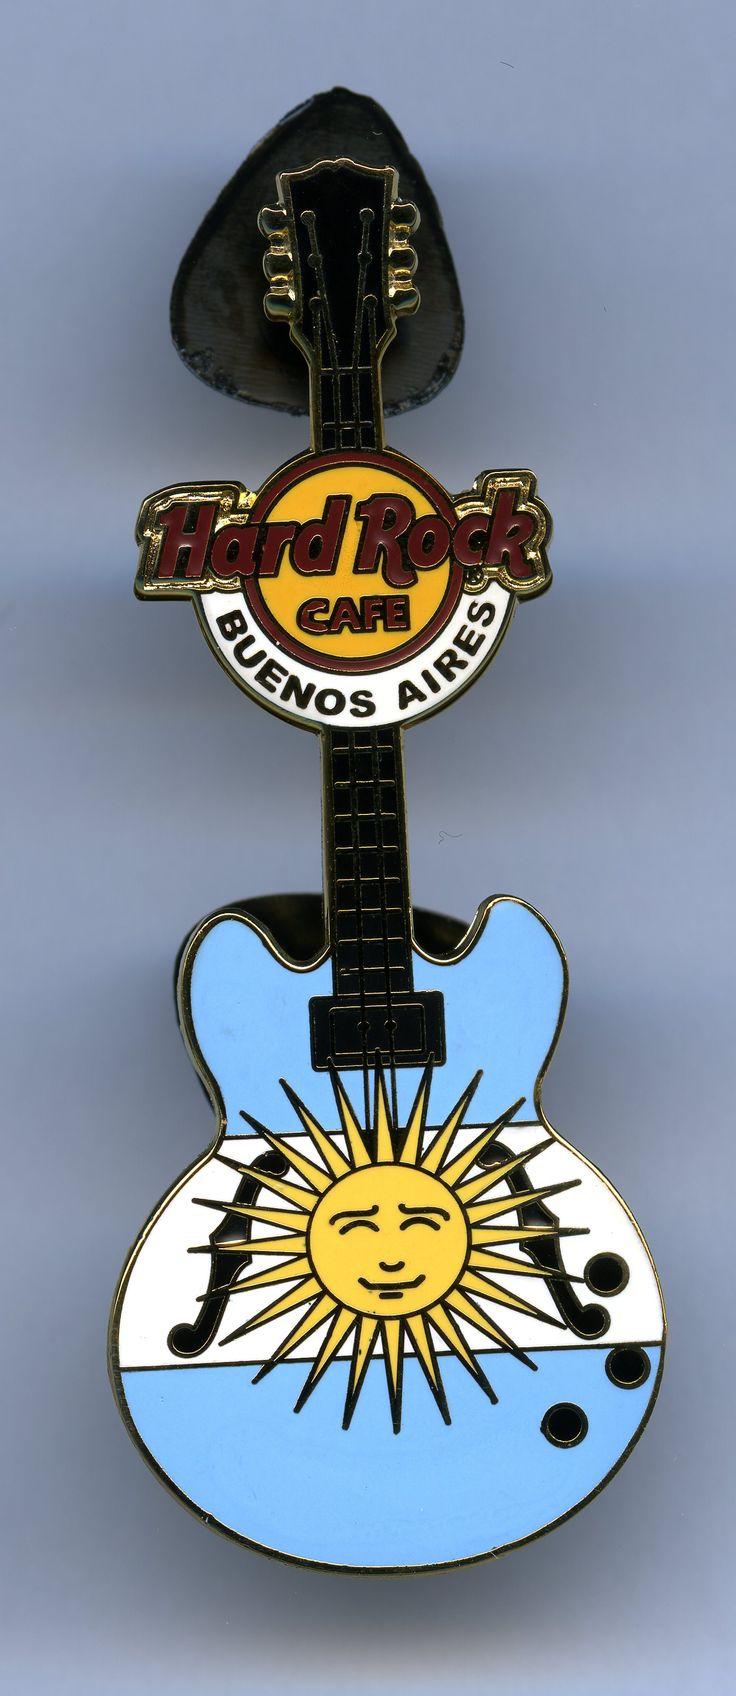 Buenos Aires - Hard Rock Cafe Guitar Pin